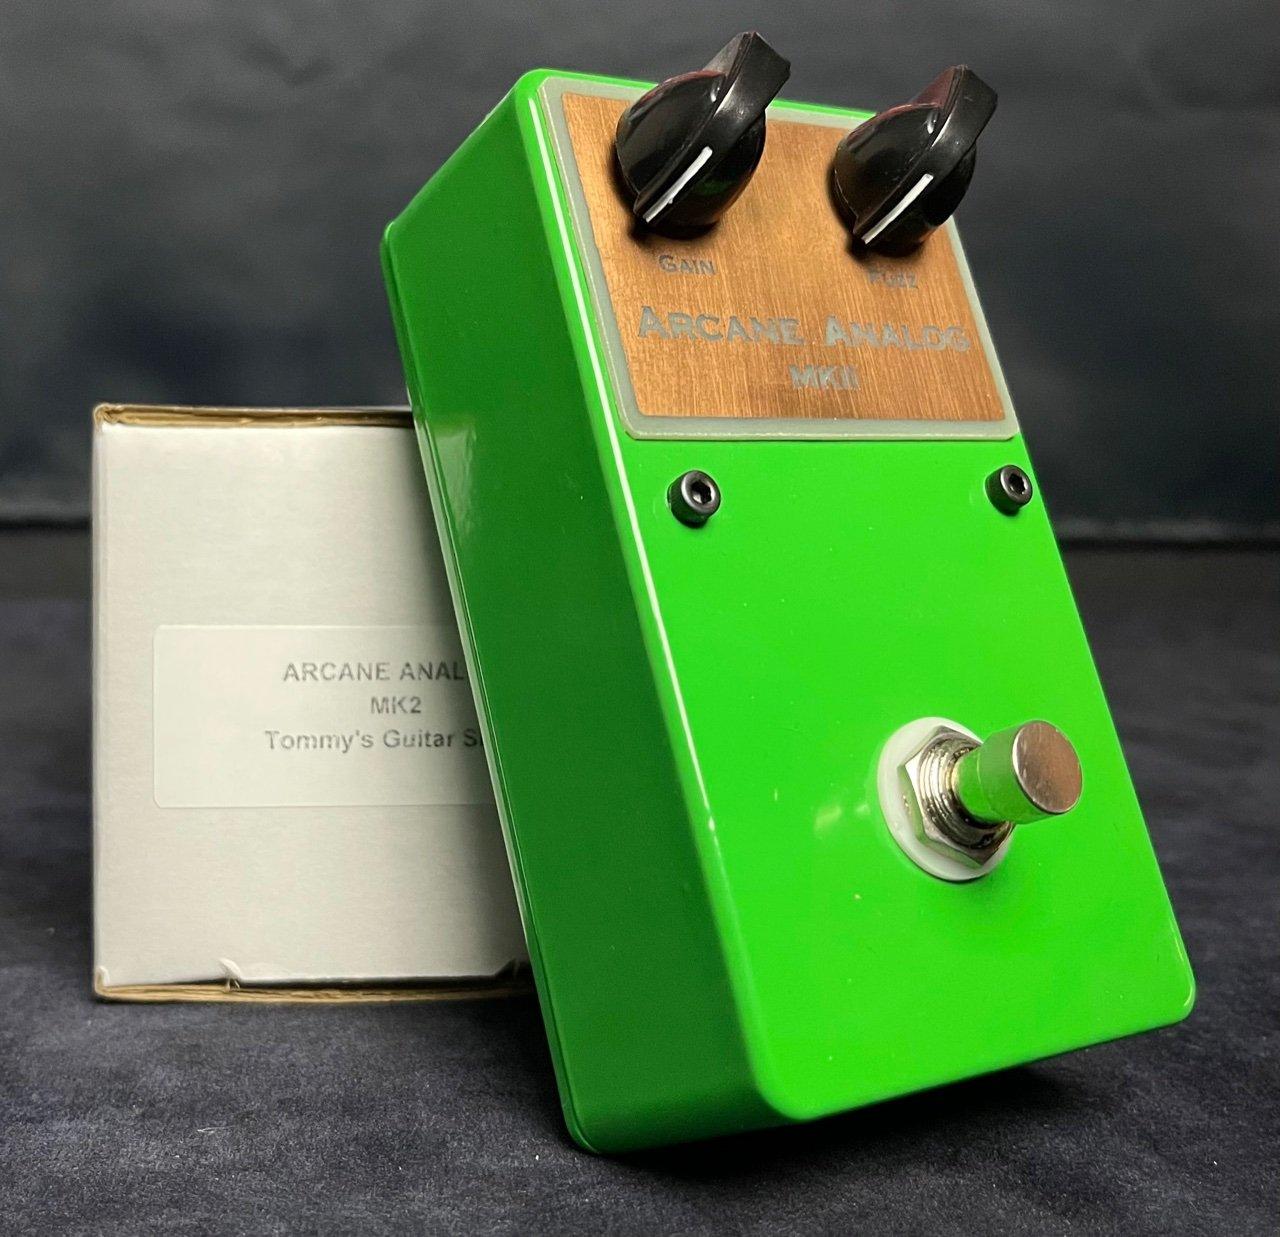 Arcane Analog Sola Sound MKII Tone Bender Hand Built on Perf-Board